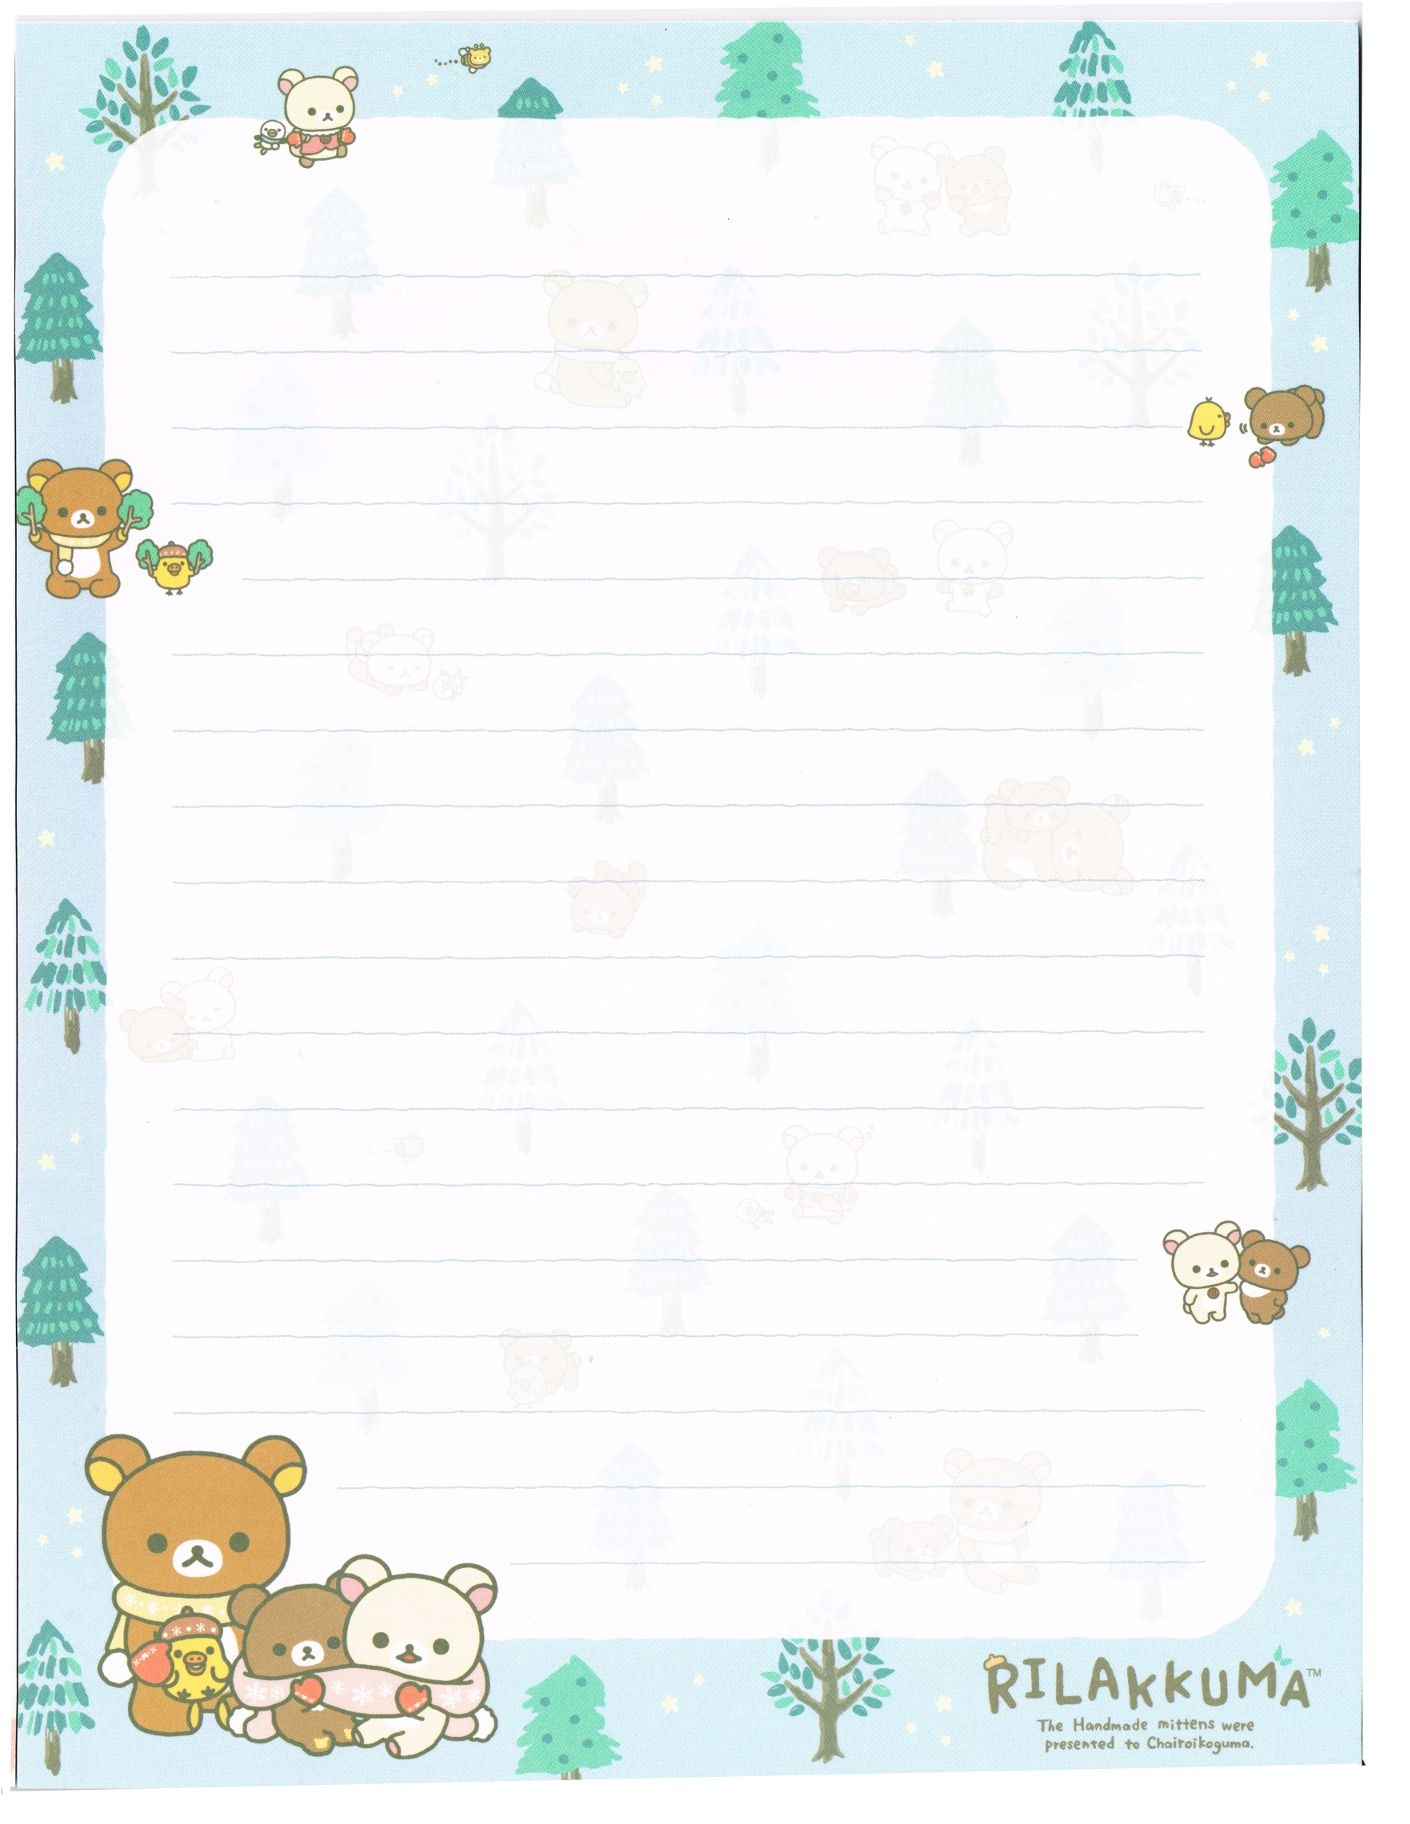 Free Printable Winter Nordic Forest Writing Memo Pad Sheet Rilakkuma - Free Printable Winter Stationery